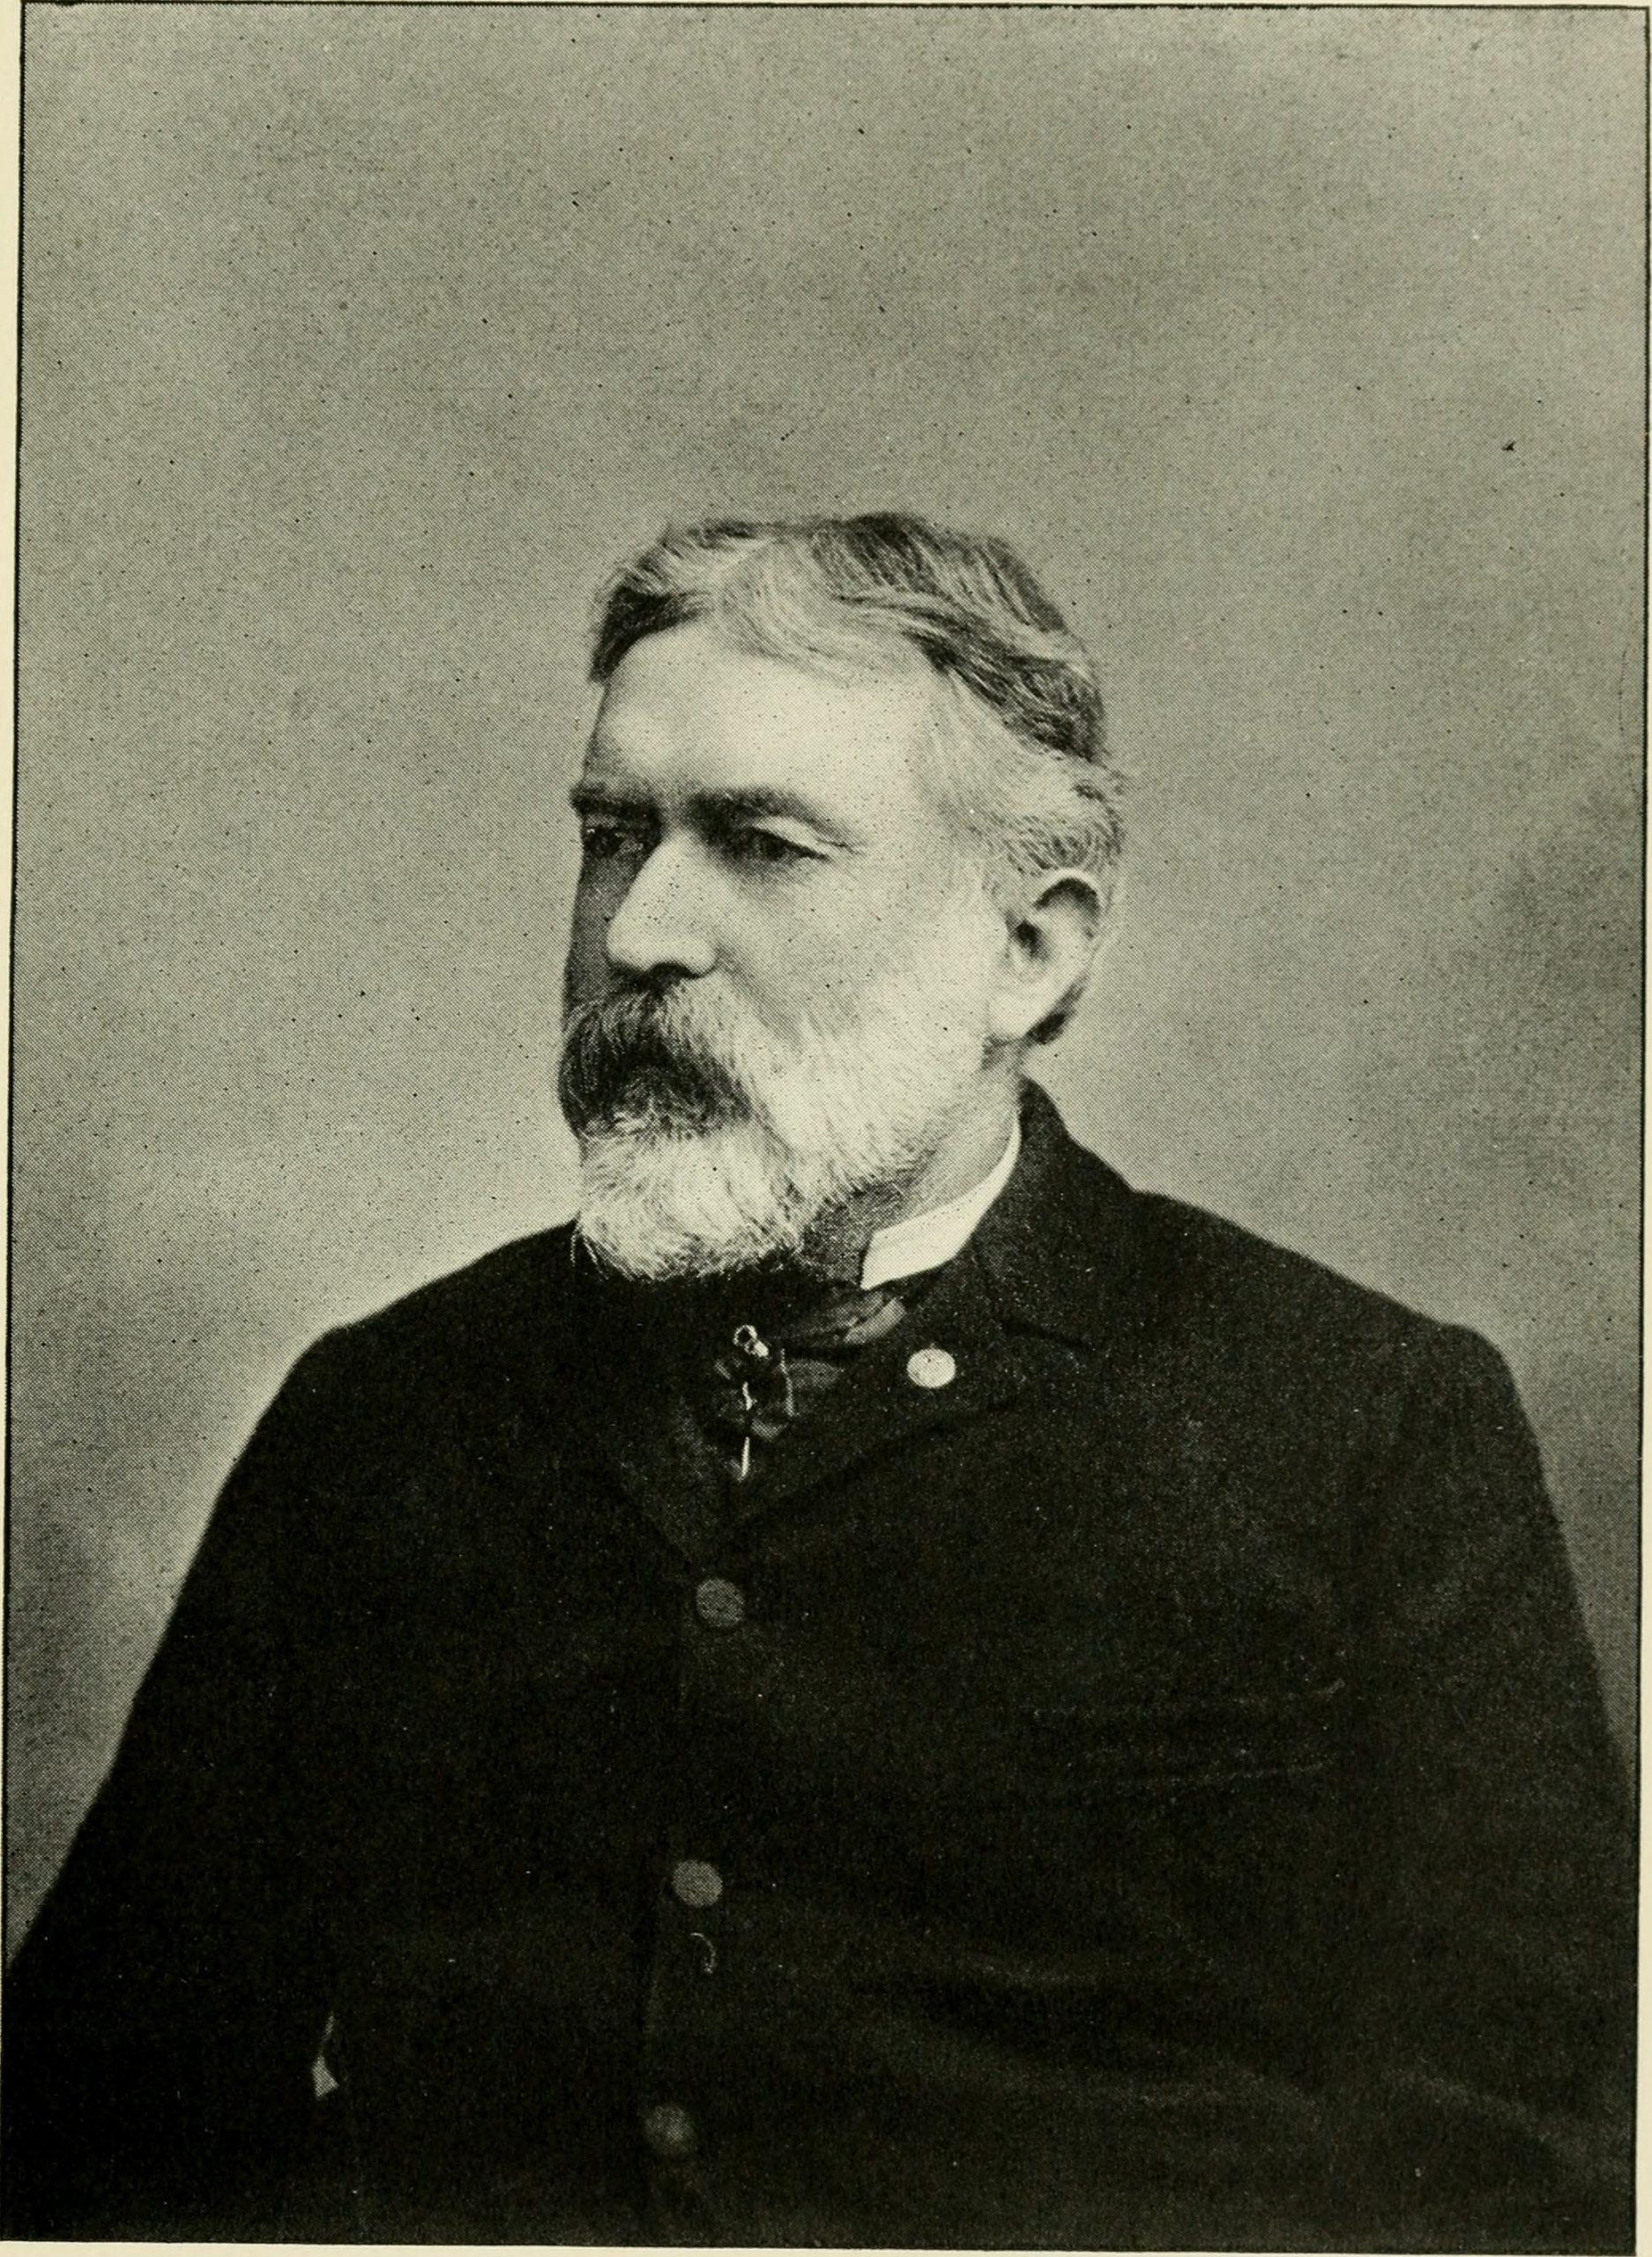 Charles Mcllvaine